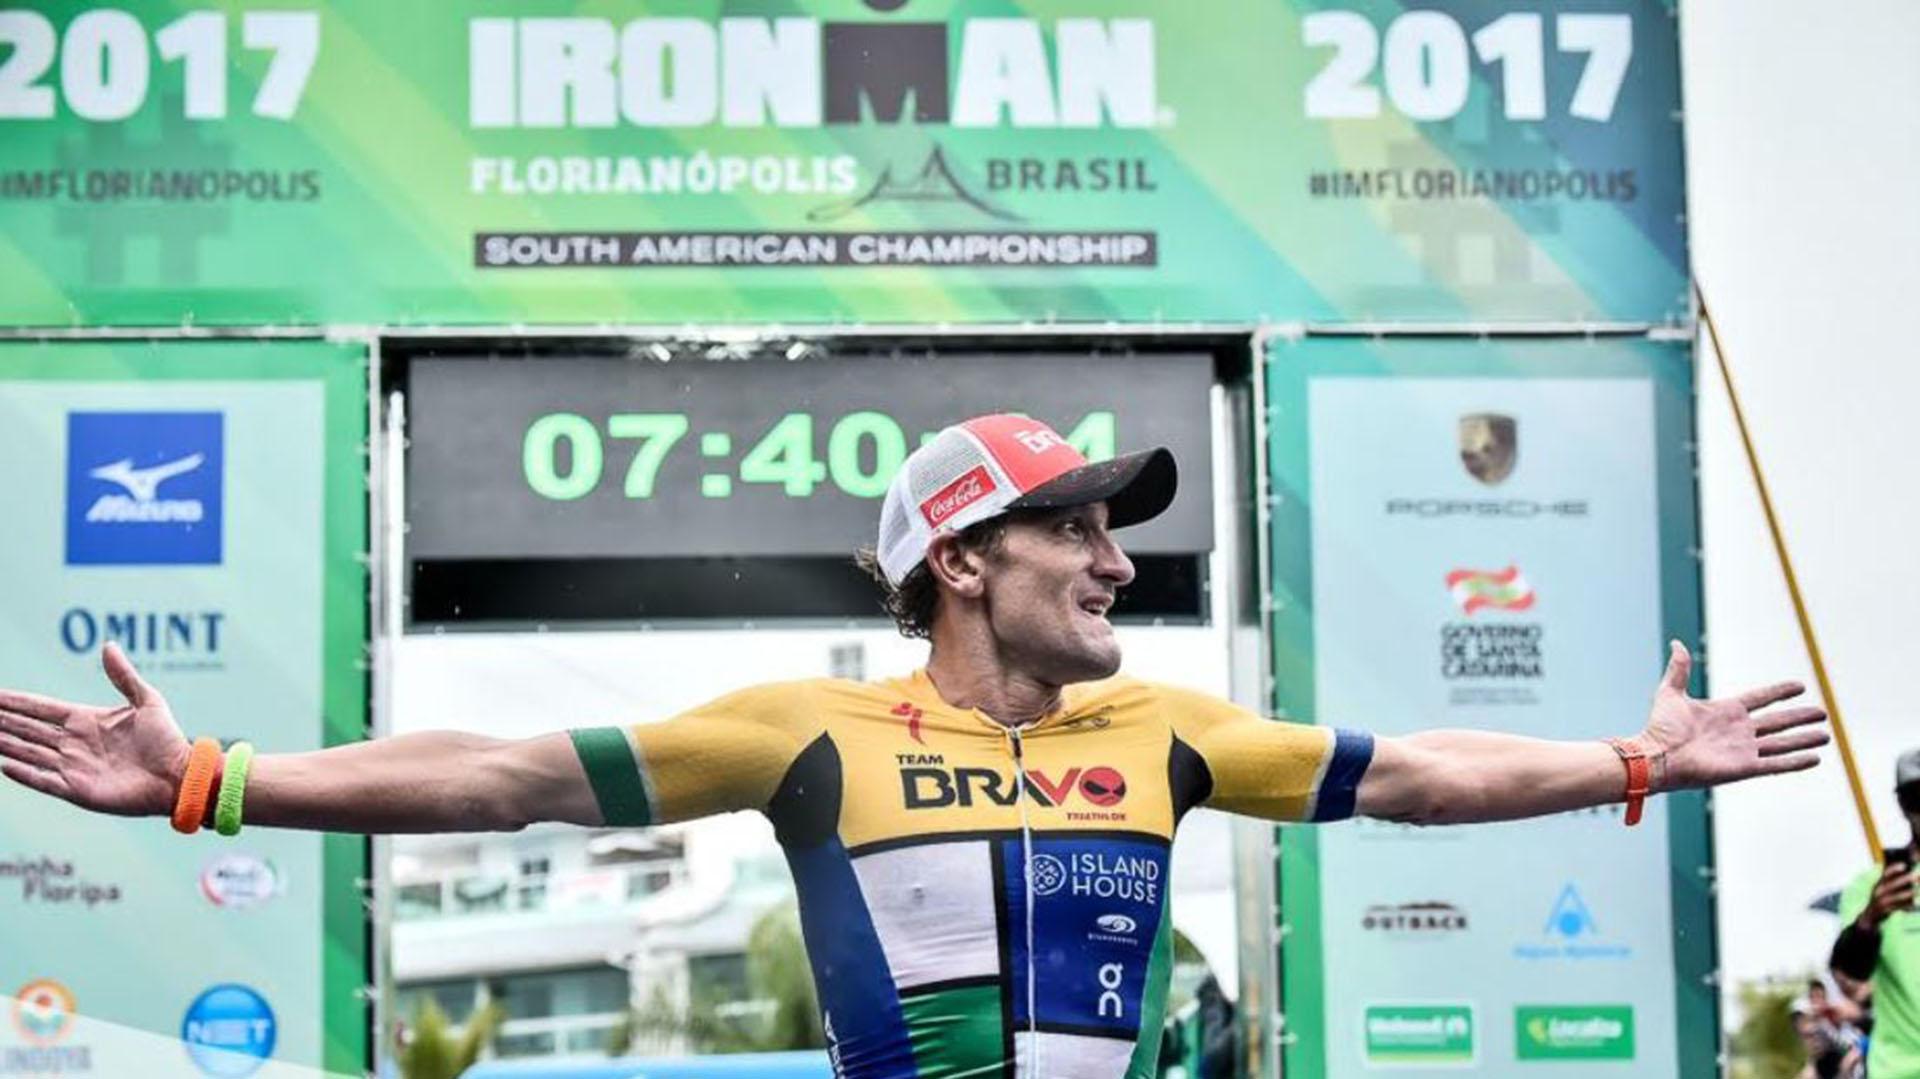 Don estableció un récord mundial en el Ironman de Brasil